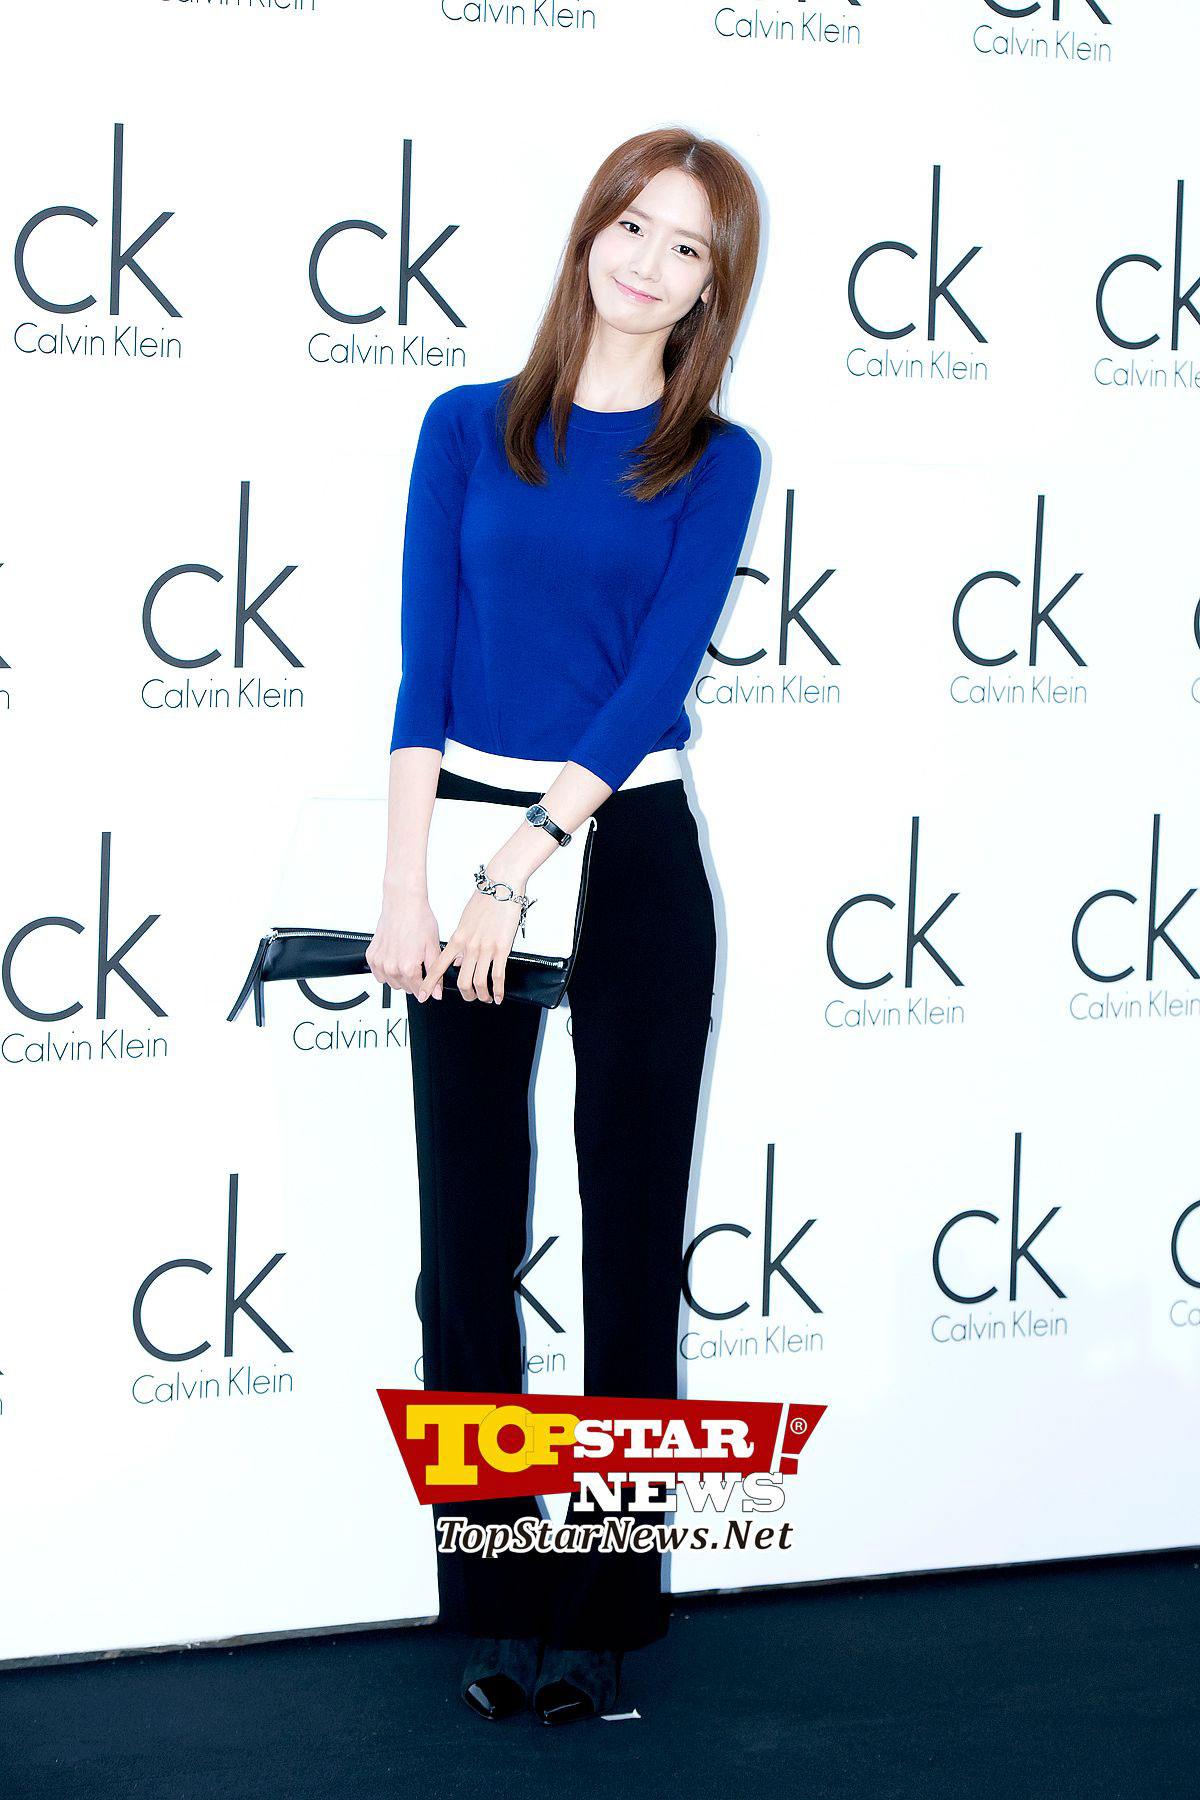 Yoona Calvin Klein event